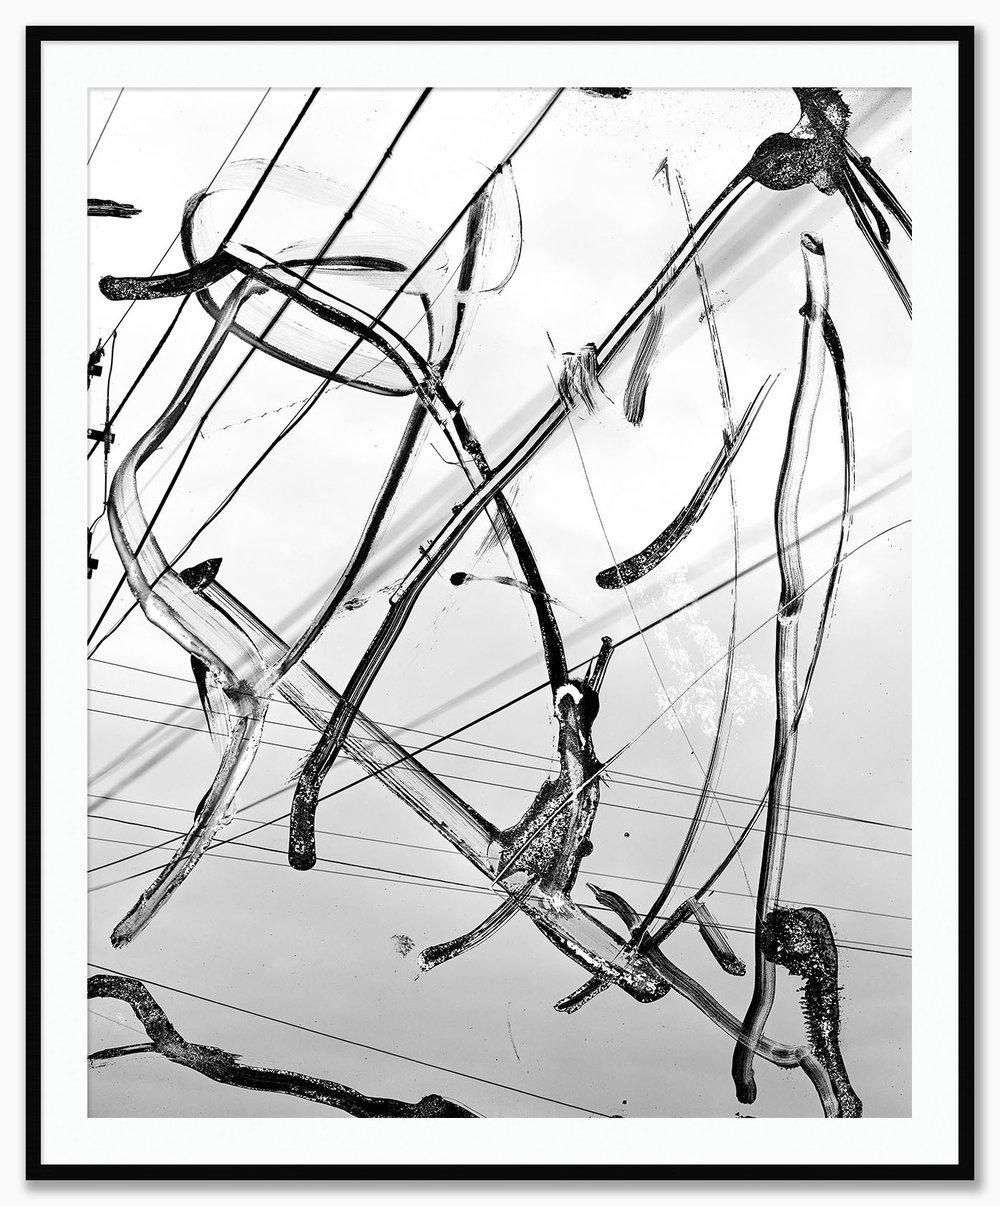 Wires_Mat_MatteBlack.jpg